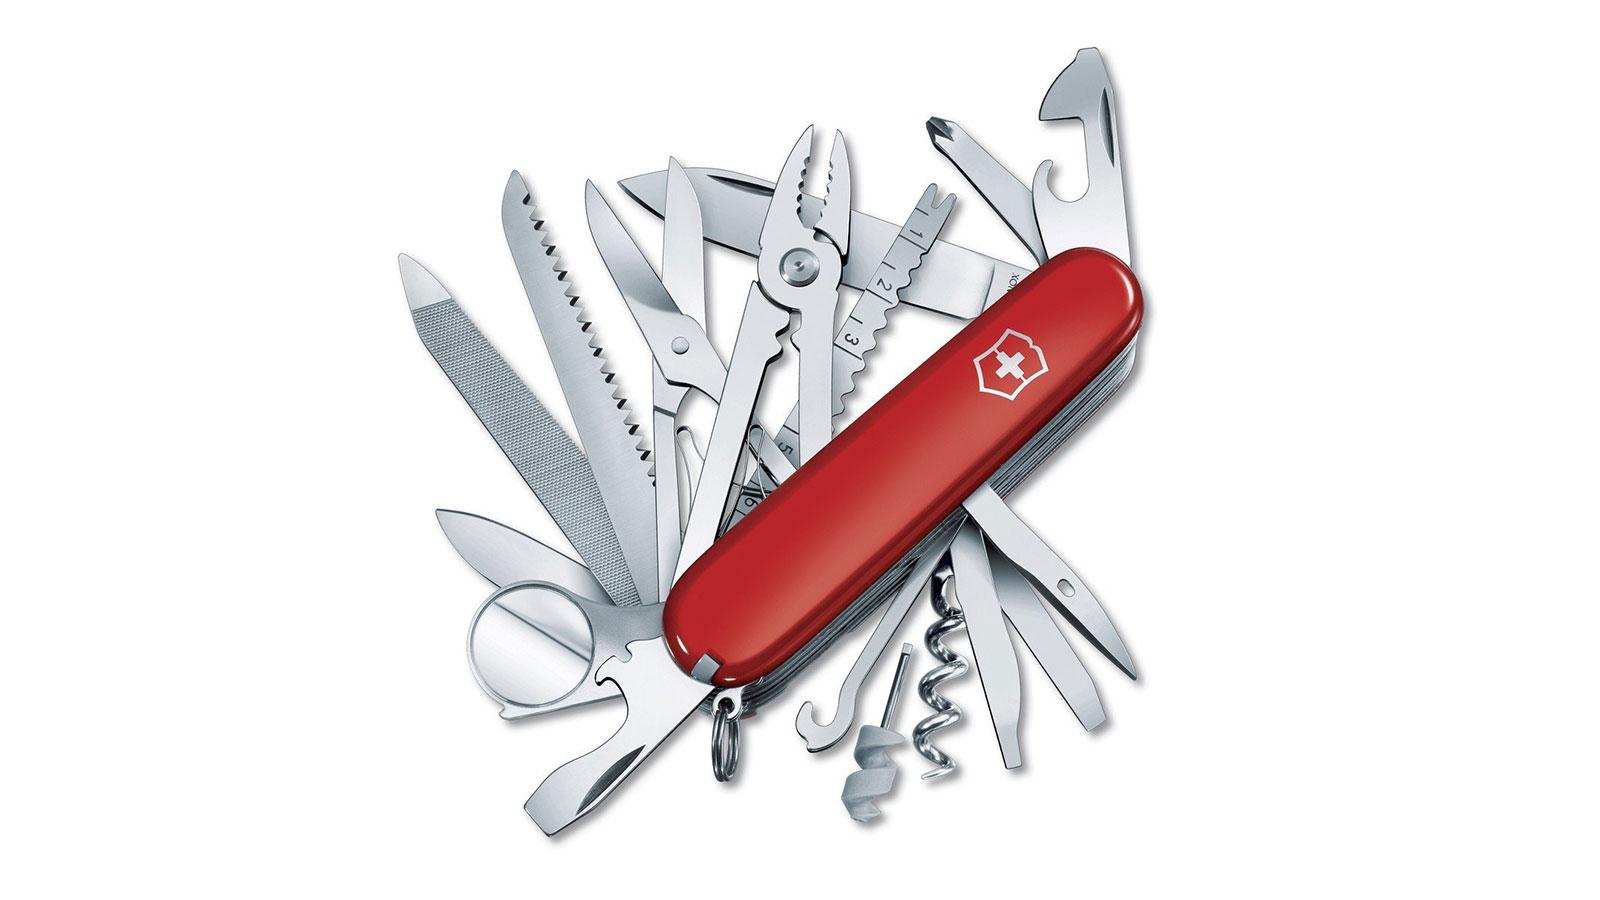 Victorinox Swiss Army Swiss Champ Pocket Knife | the best swiss army knives